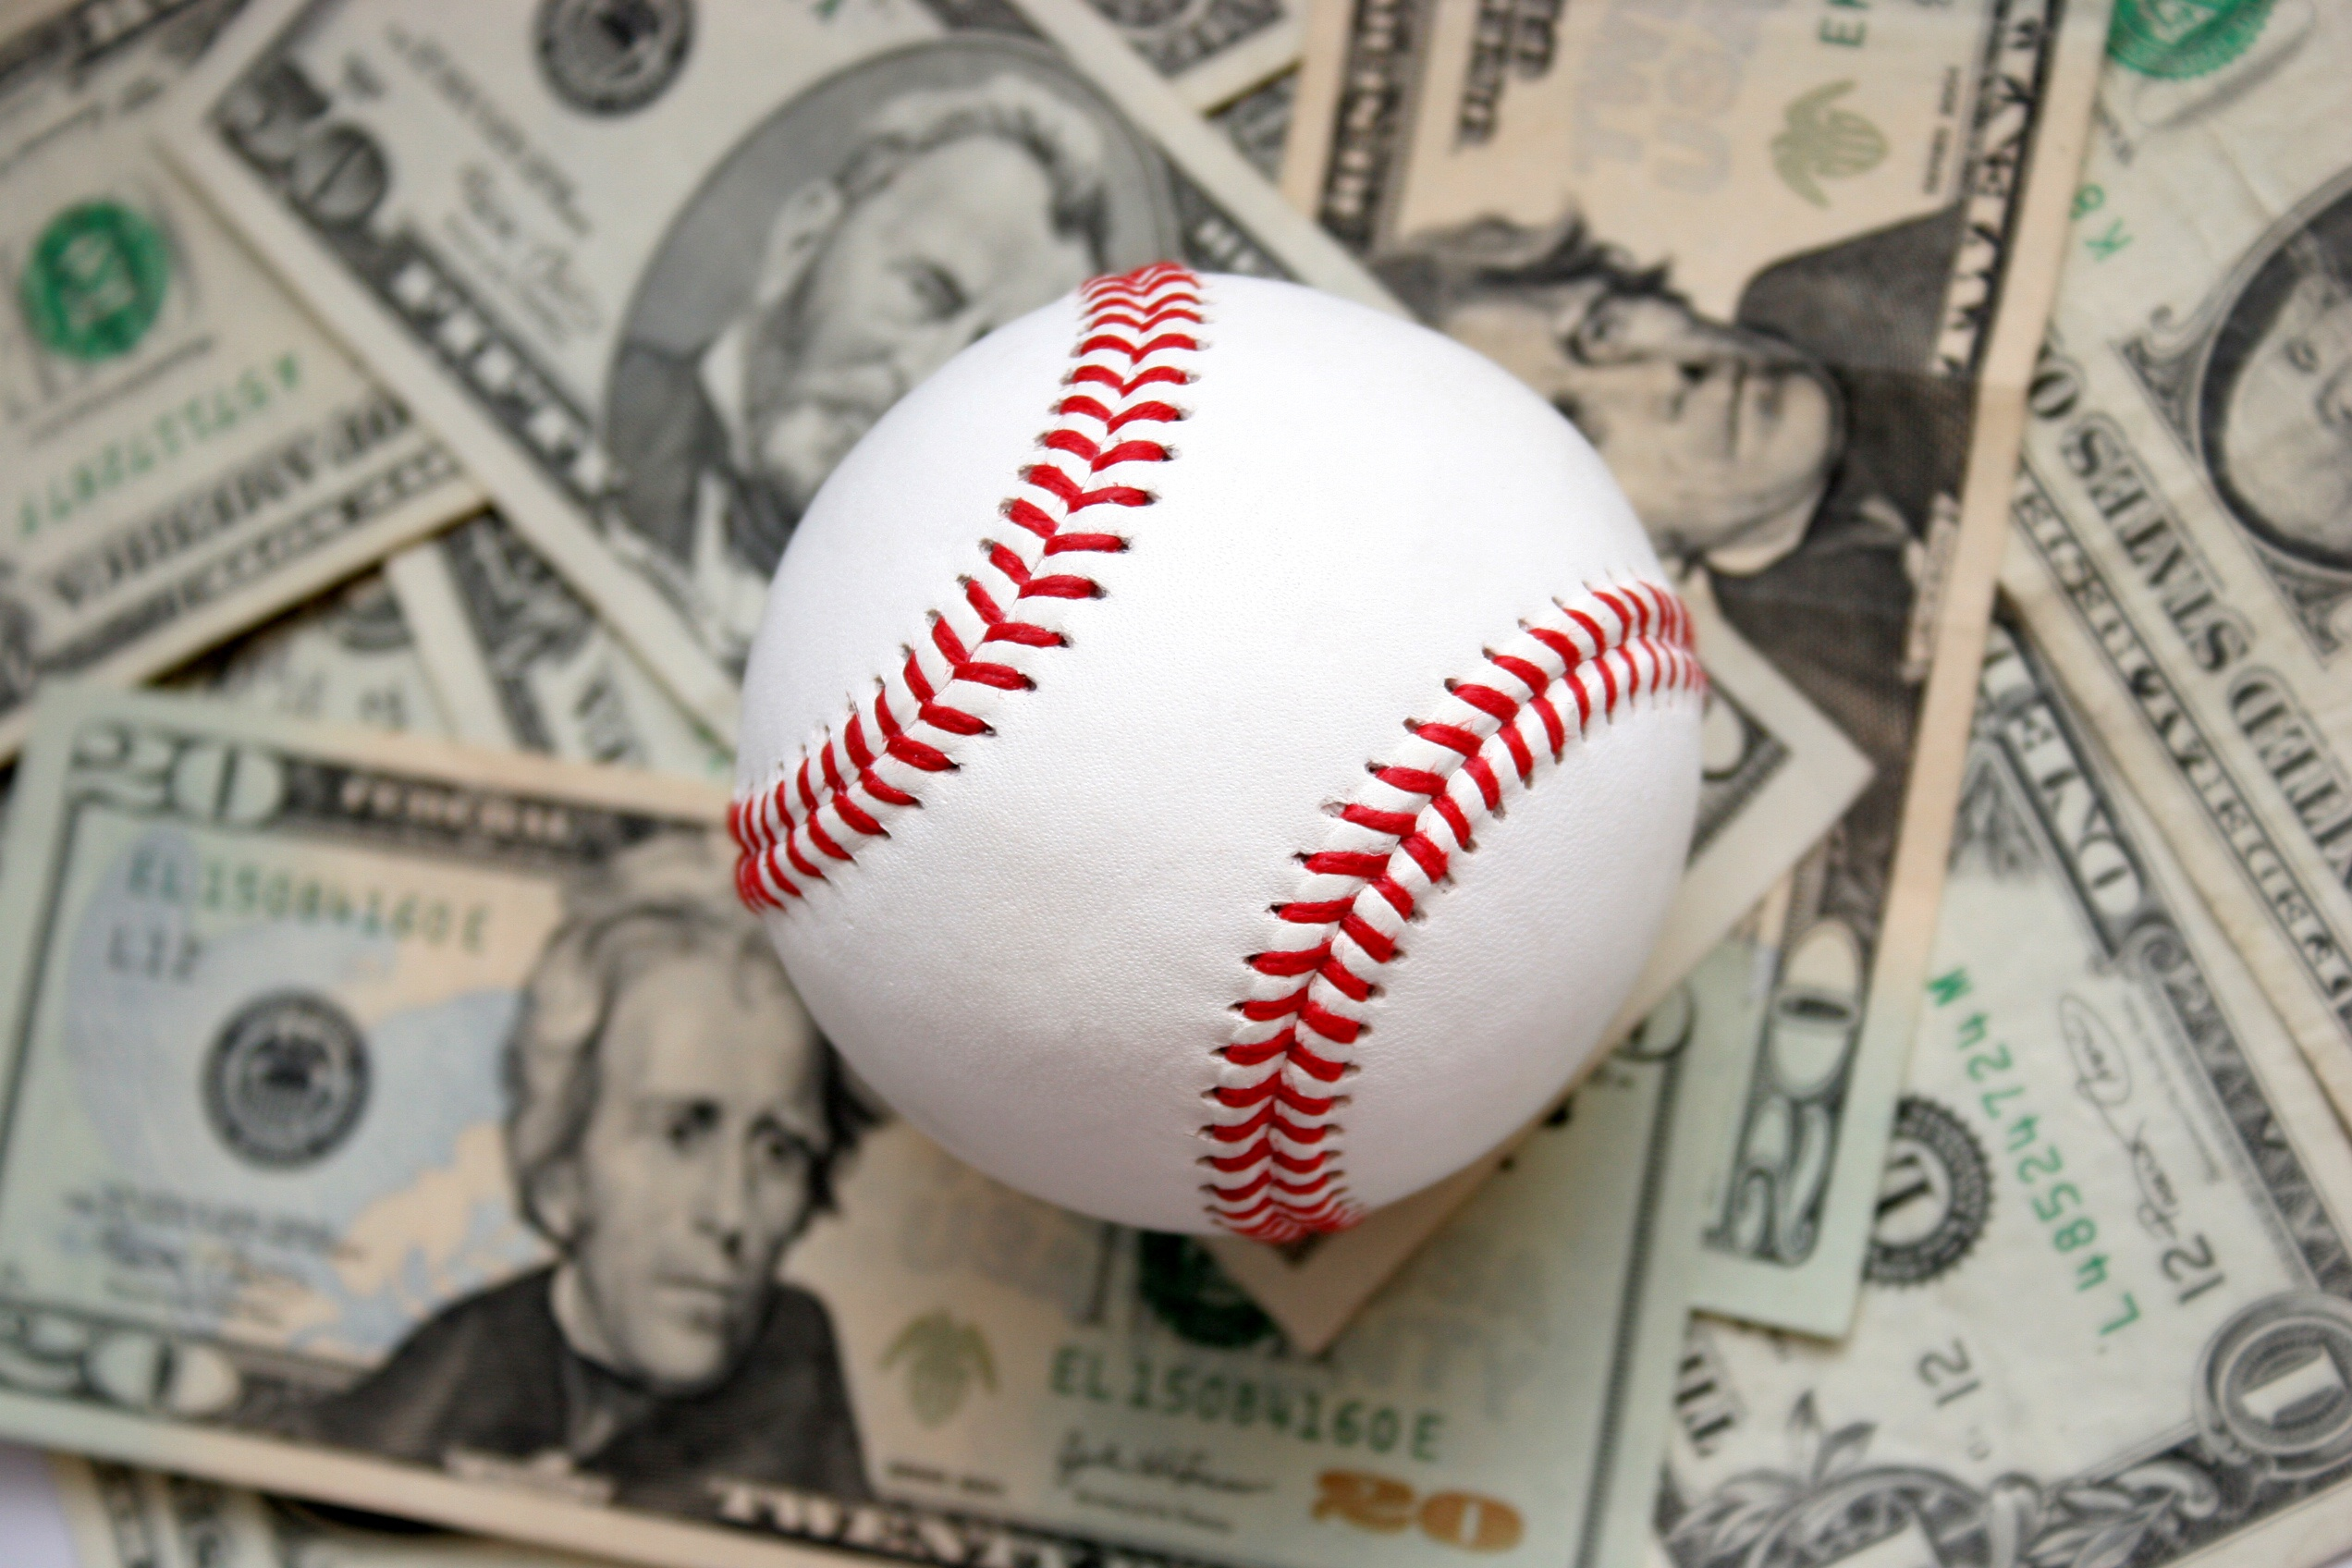 Power BI Dasbhoard Moneyball for Business